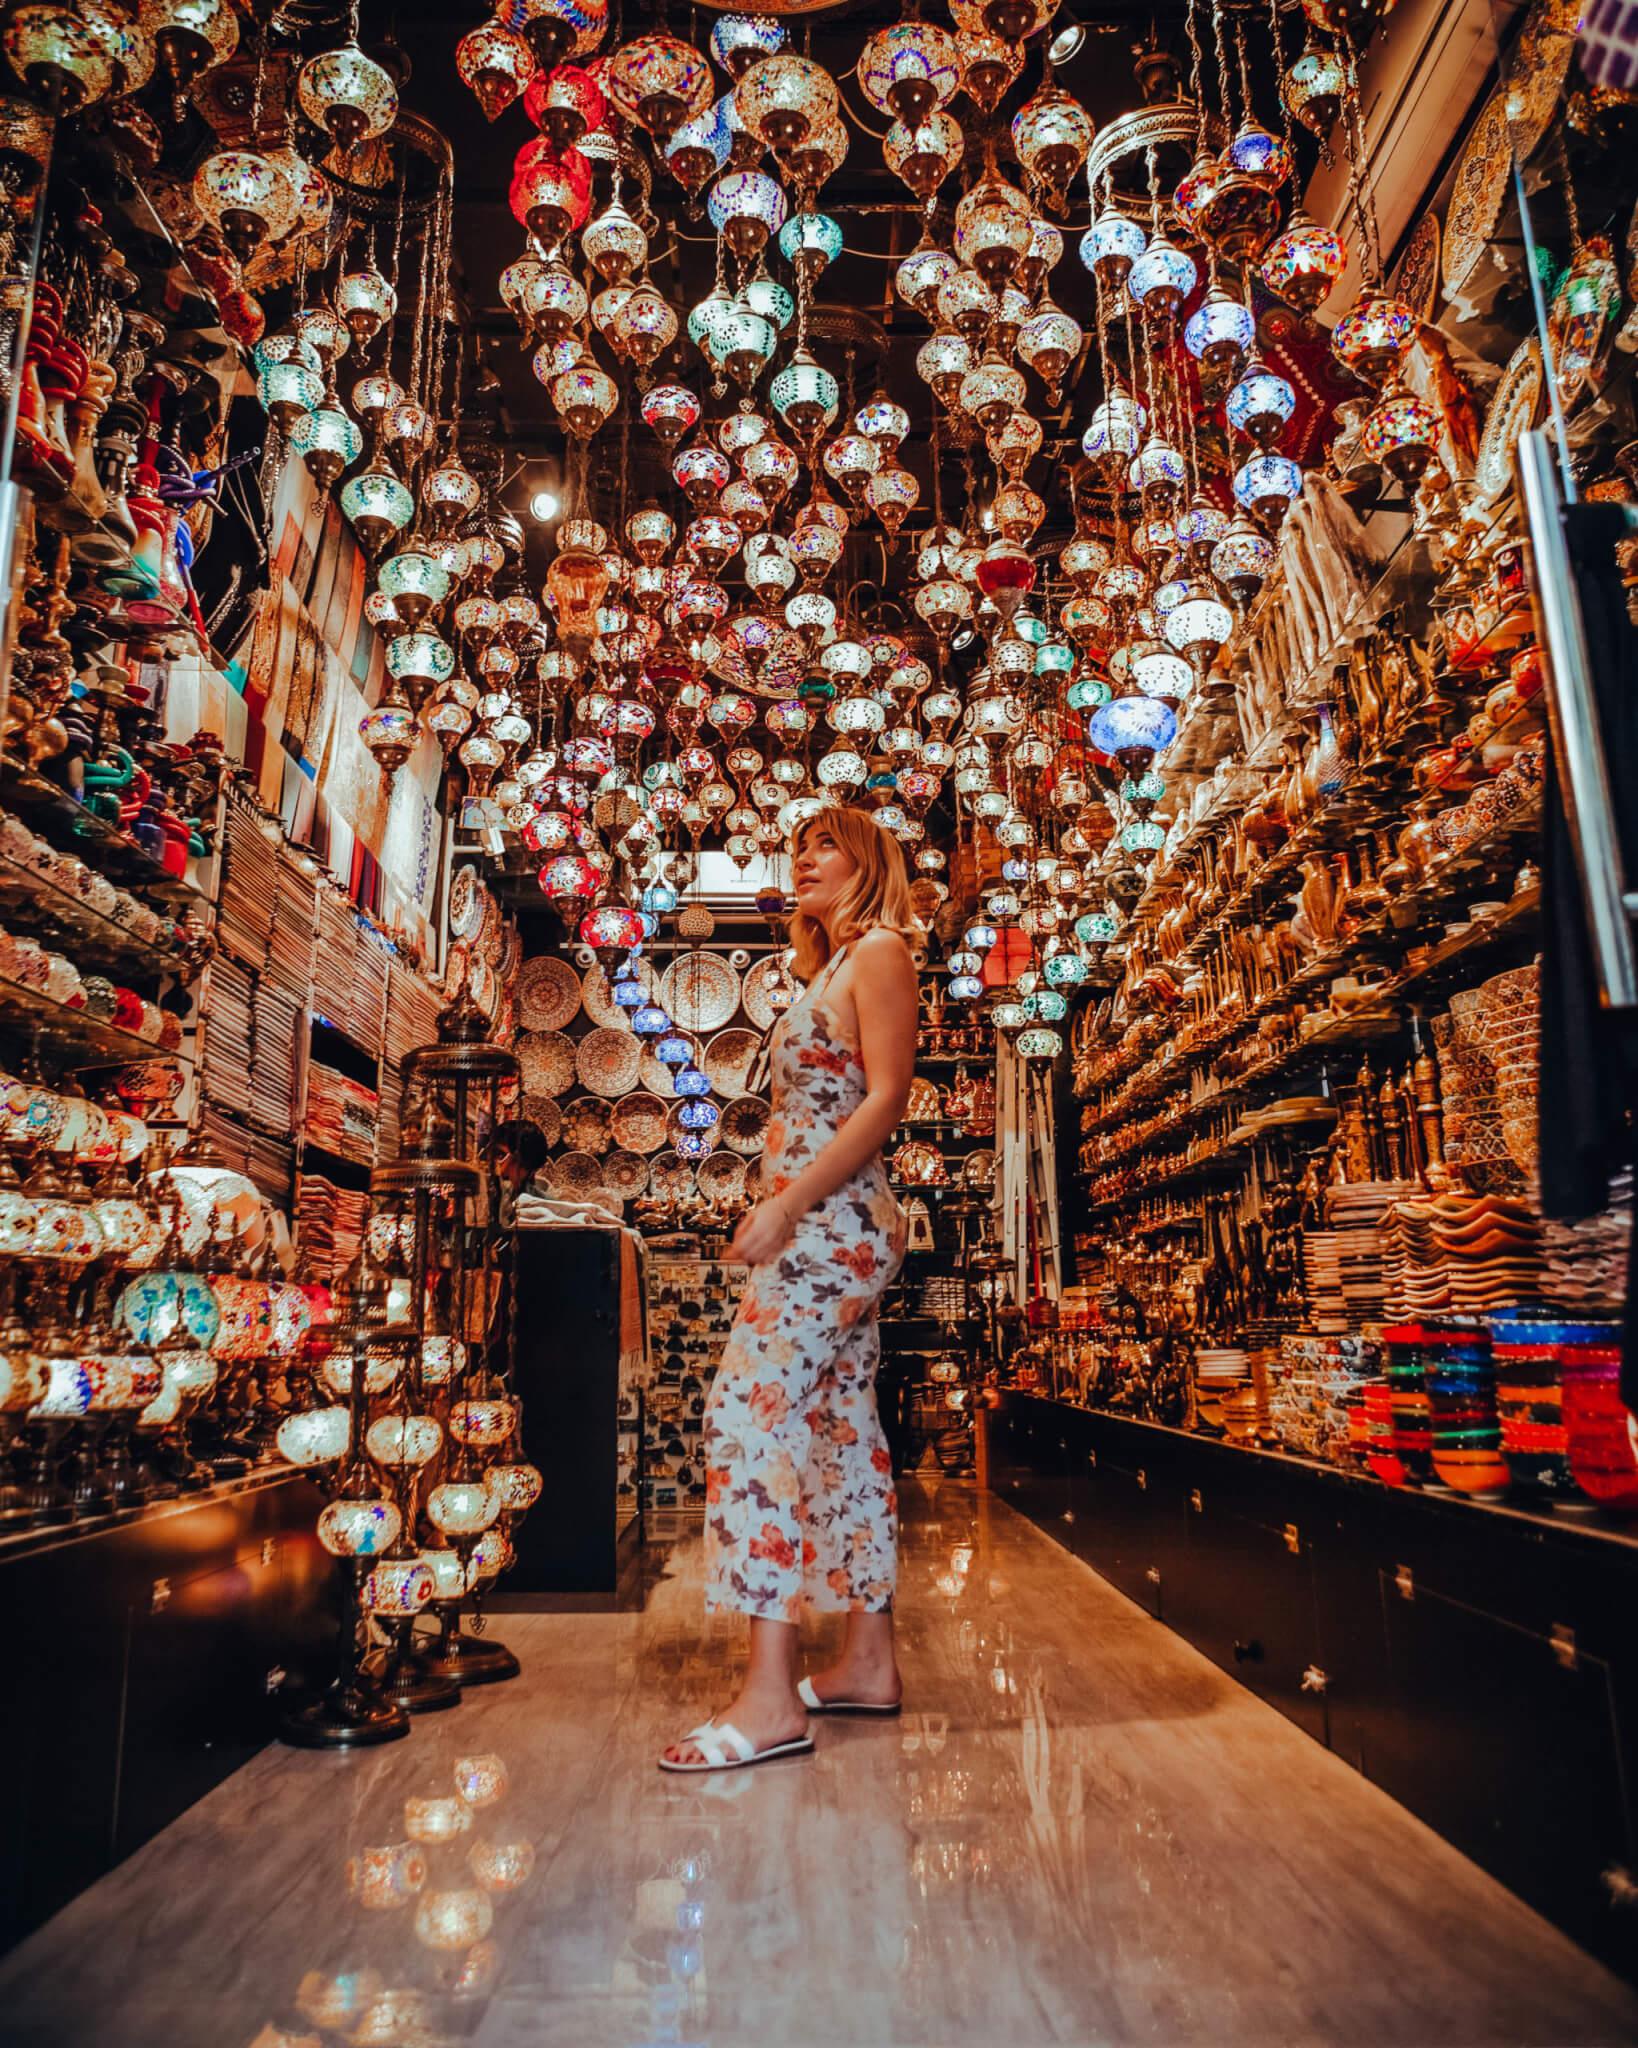 5 best things to do in Dubai 2020 - Dubai Souks